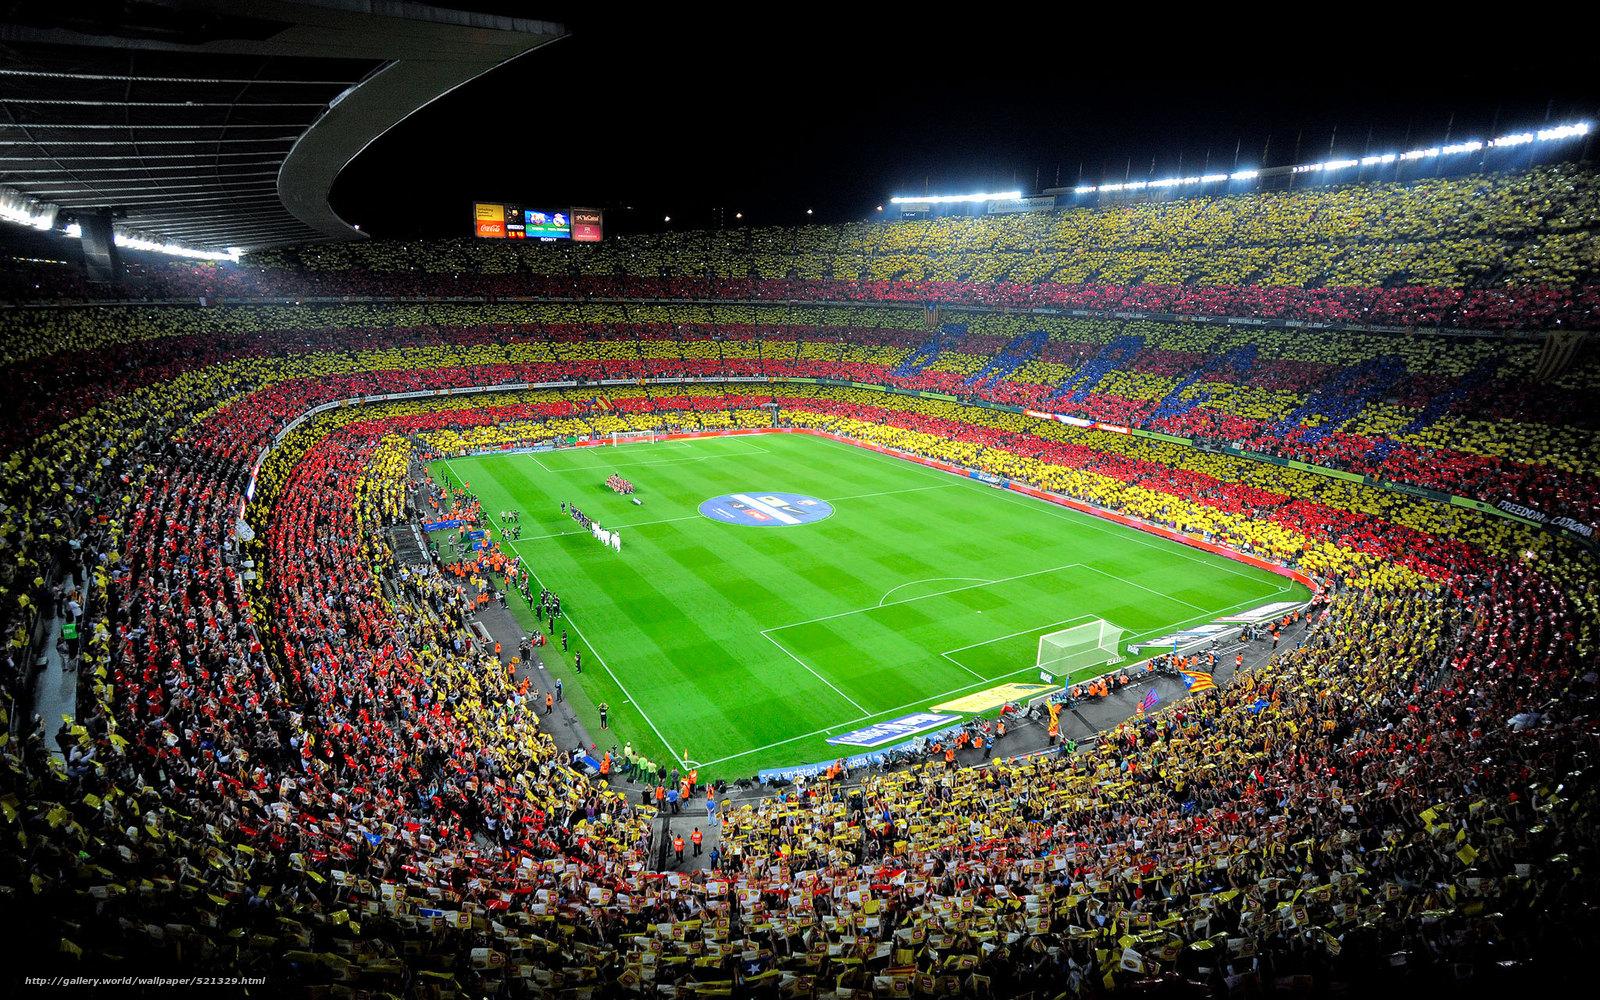 Download wallpaper Real Madrid Sport Camp Nou FC 1600x1000